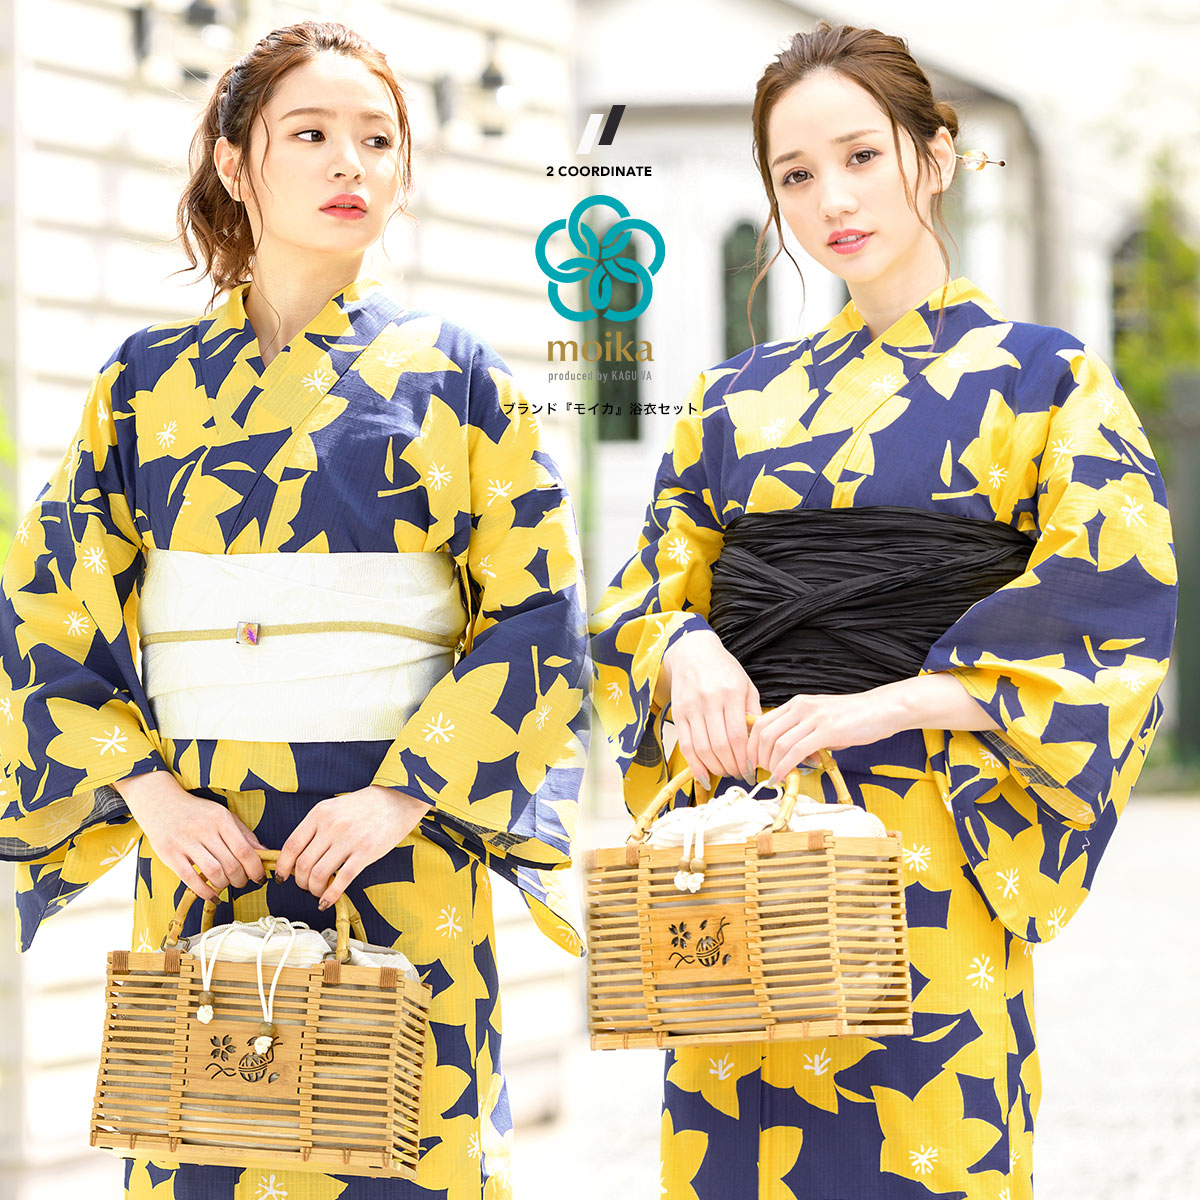 moika 浴衣 セット レディース 浴衣セット Mサイズ レトロ 紺 ネイビー 桔梗 花 フラワー 衿芯付き 女性用 仕立て上がり